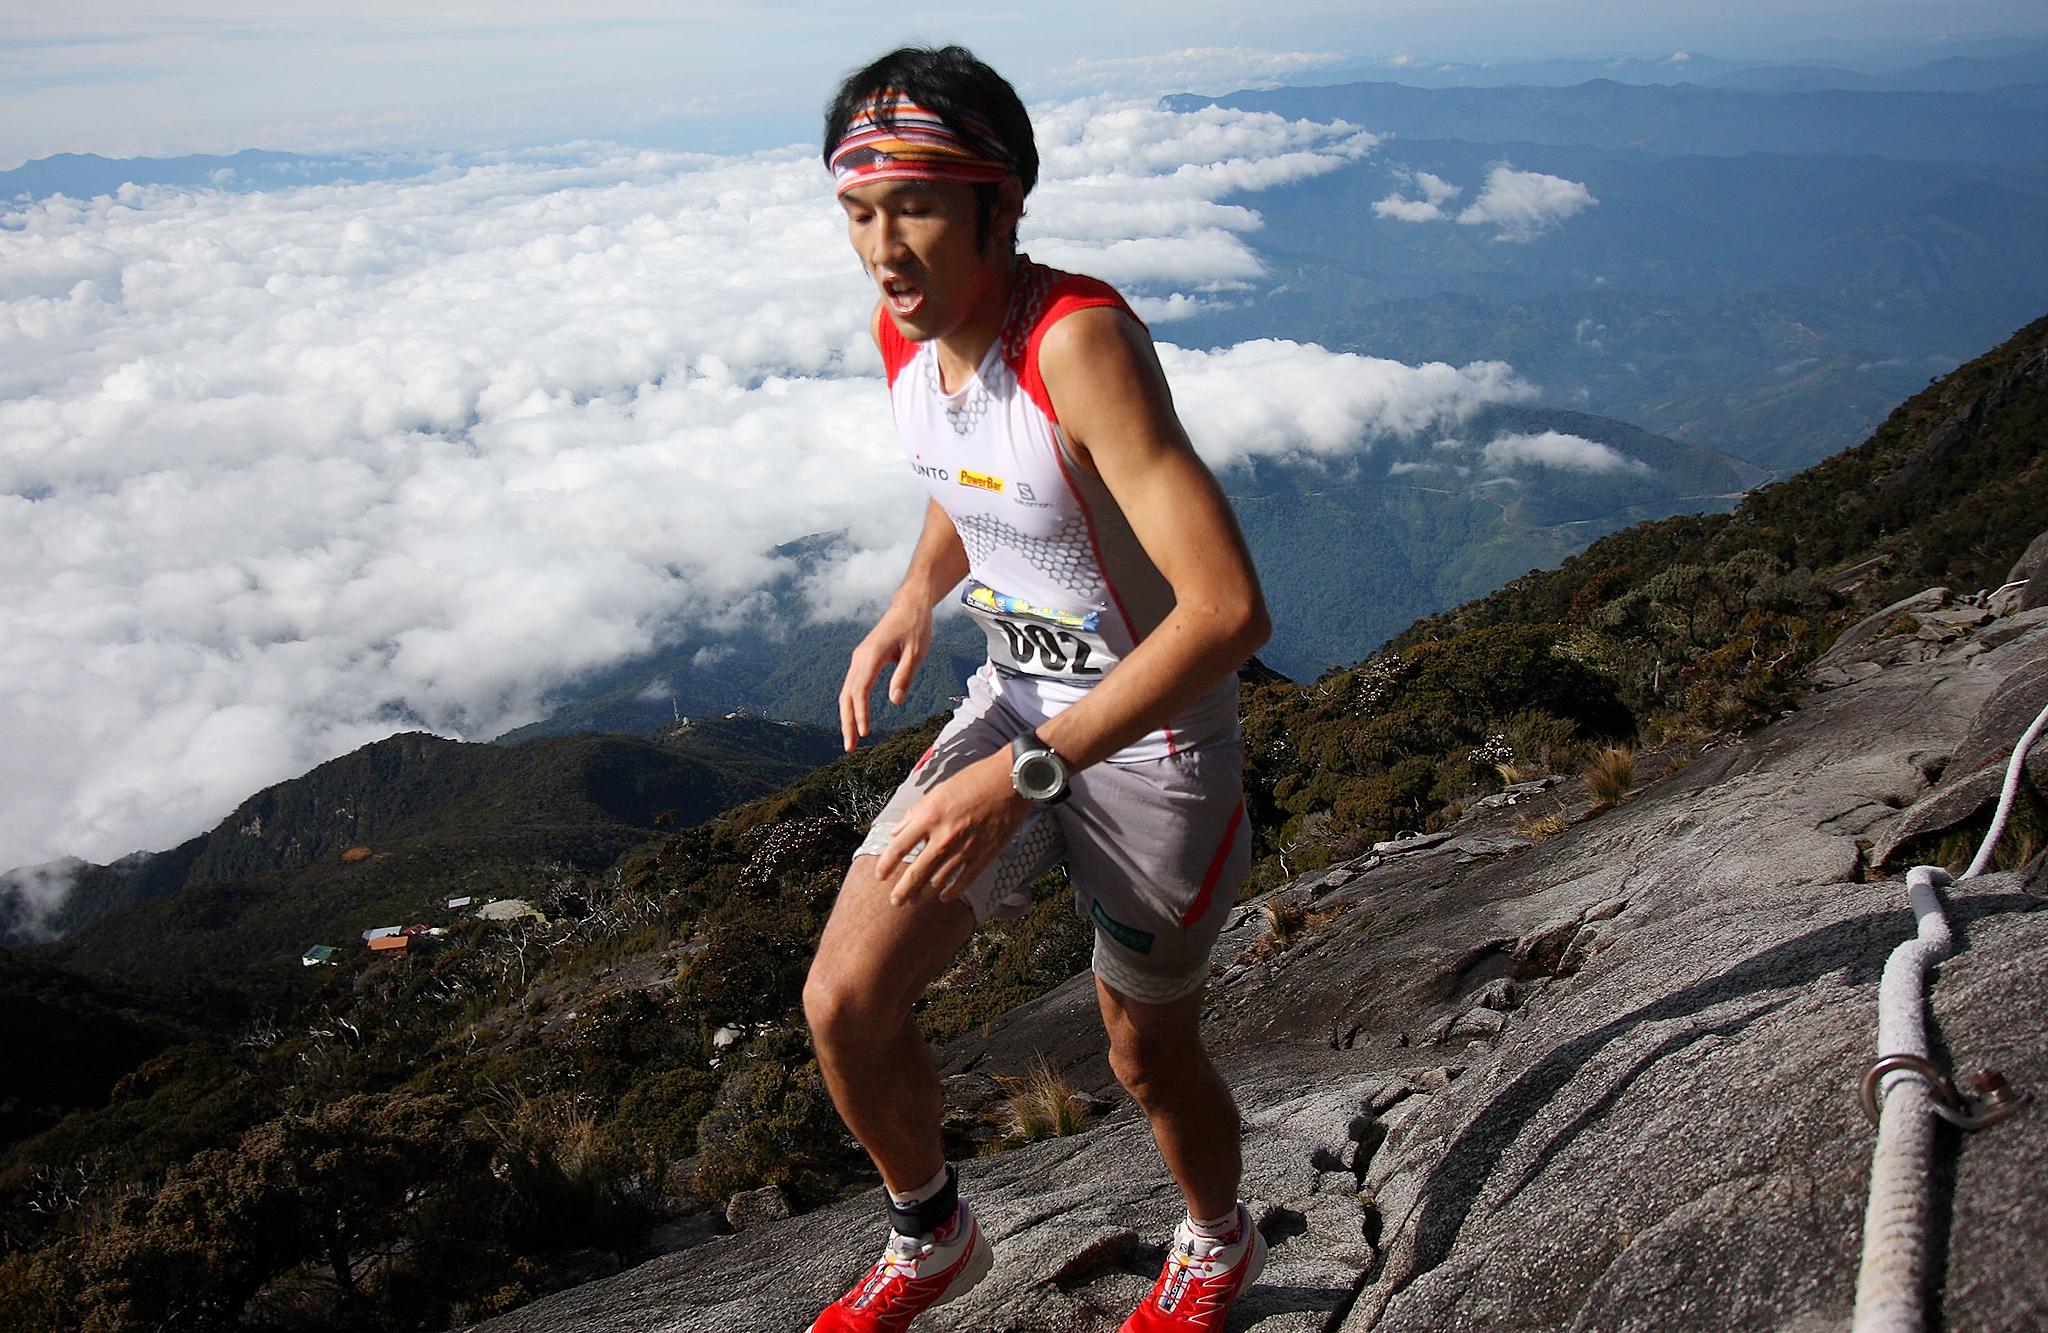 Mount Kinabalu Climbathon